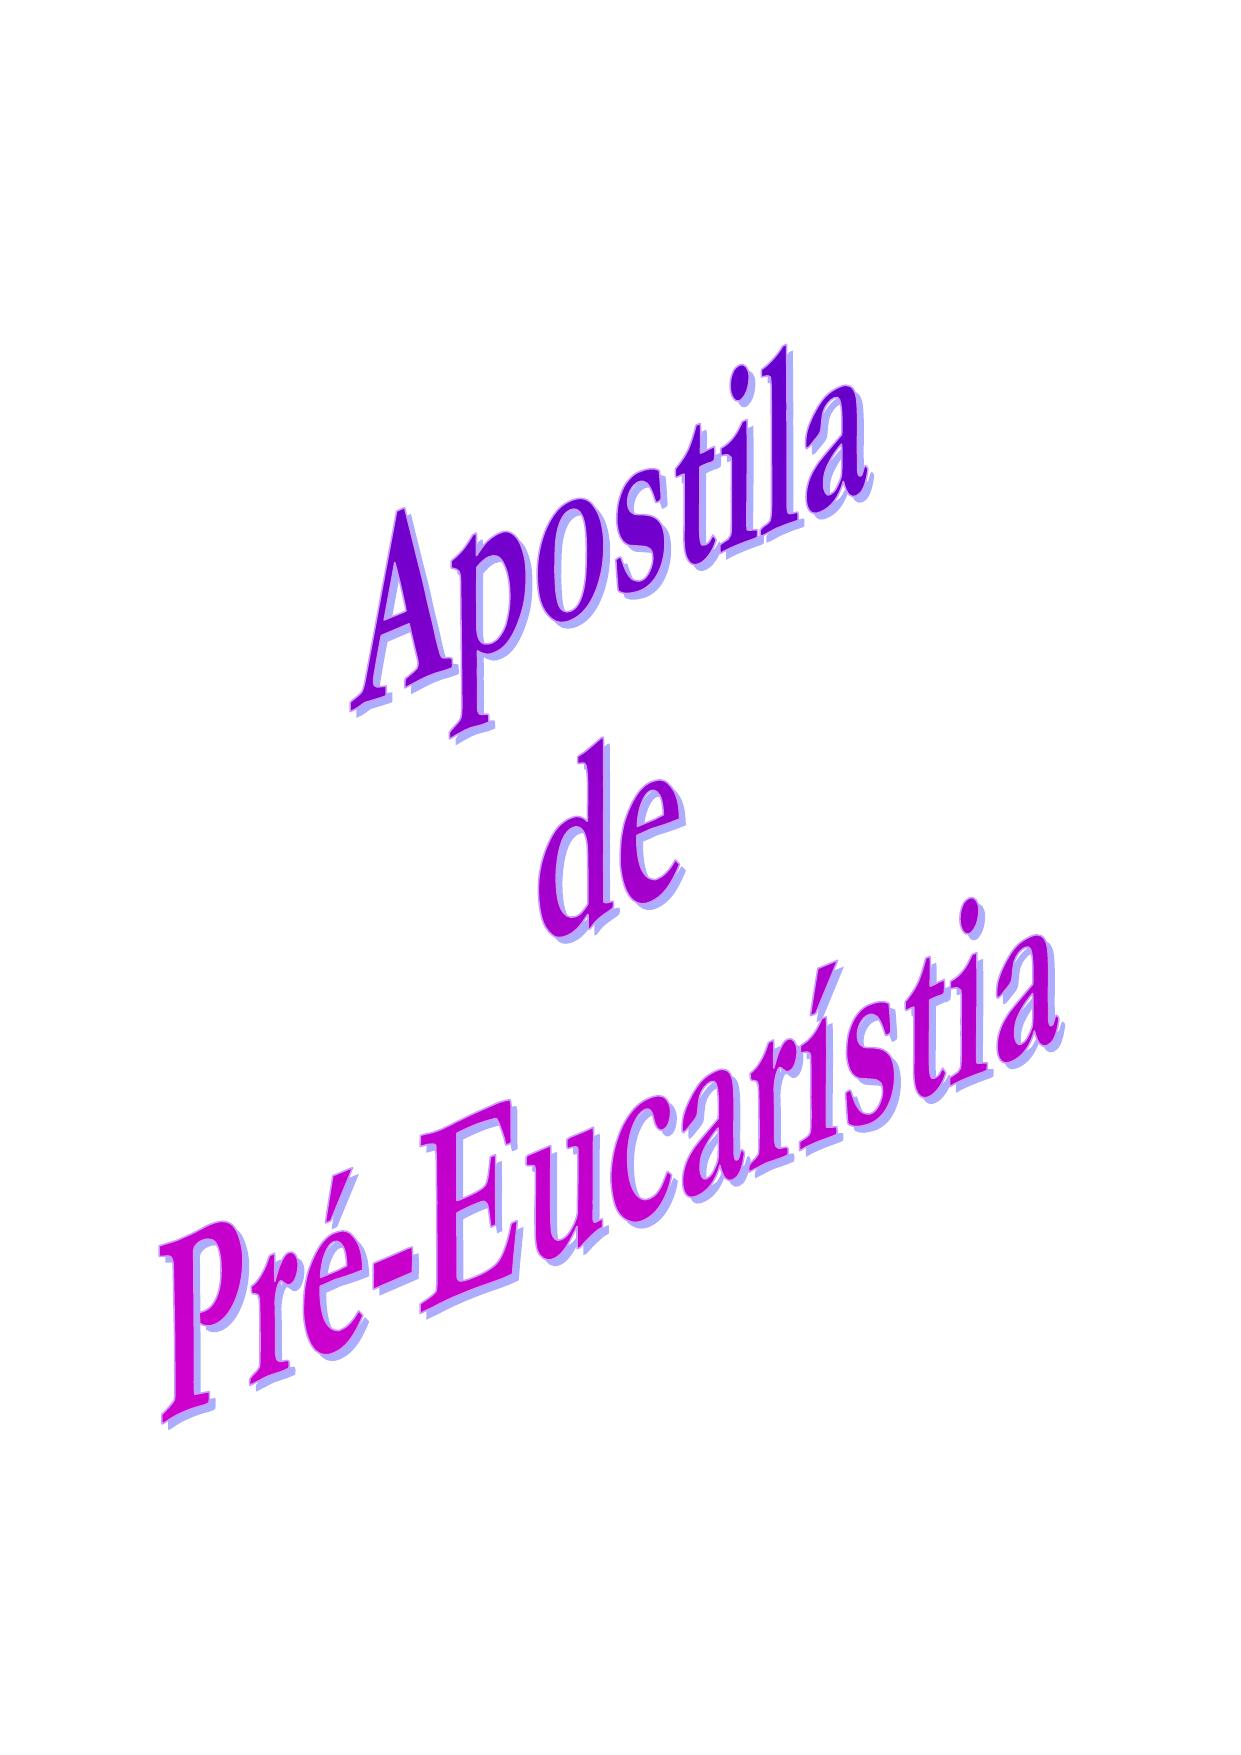 Apostila De Pre Eucaristia